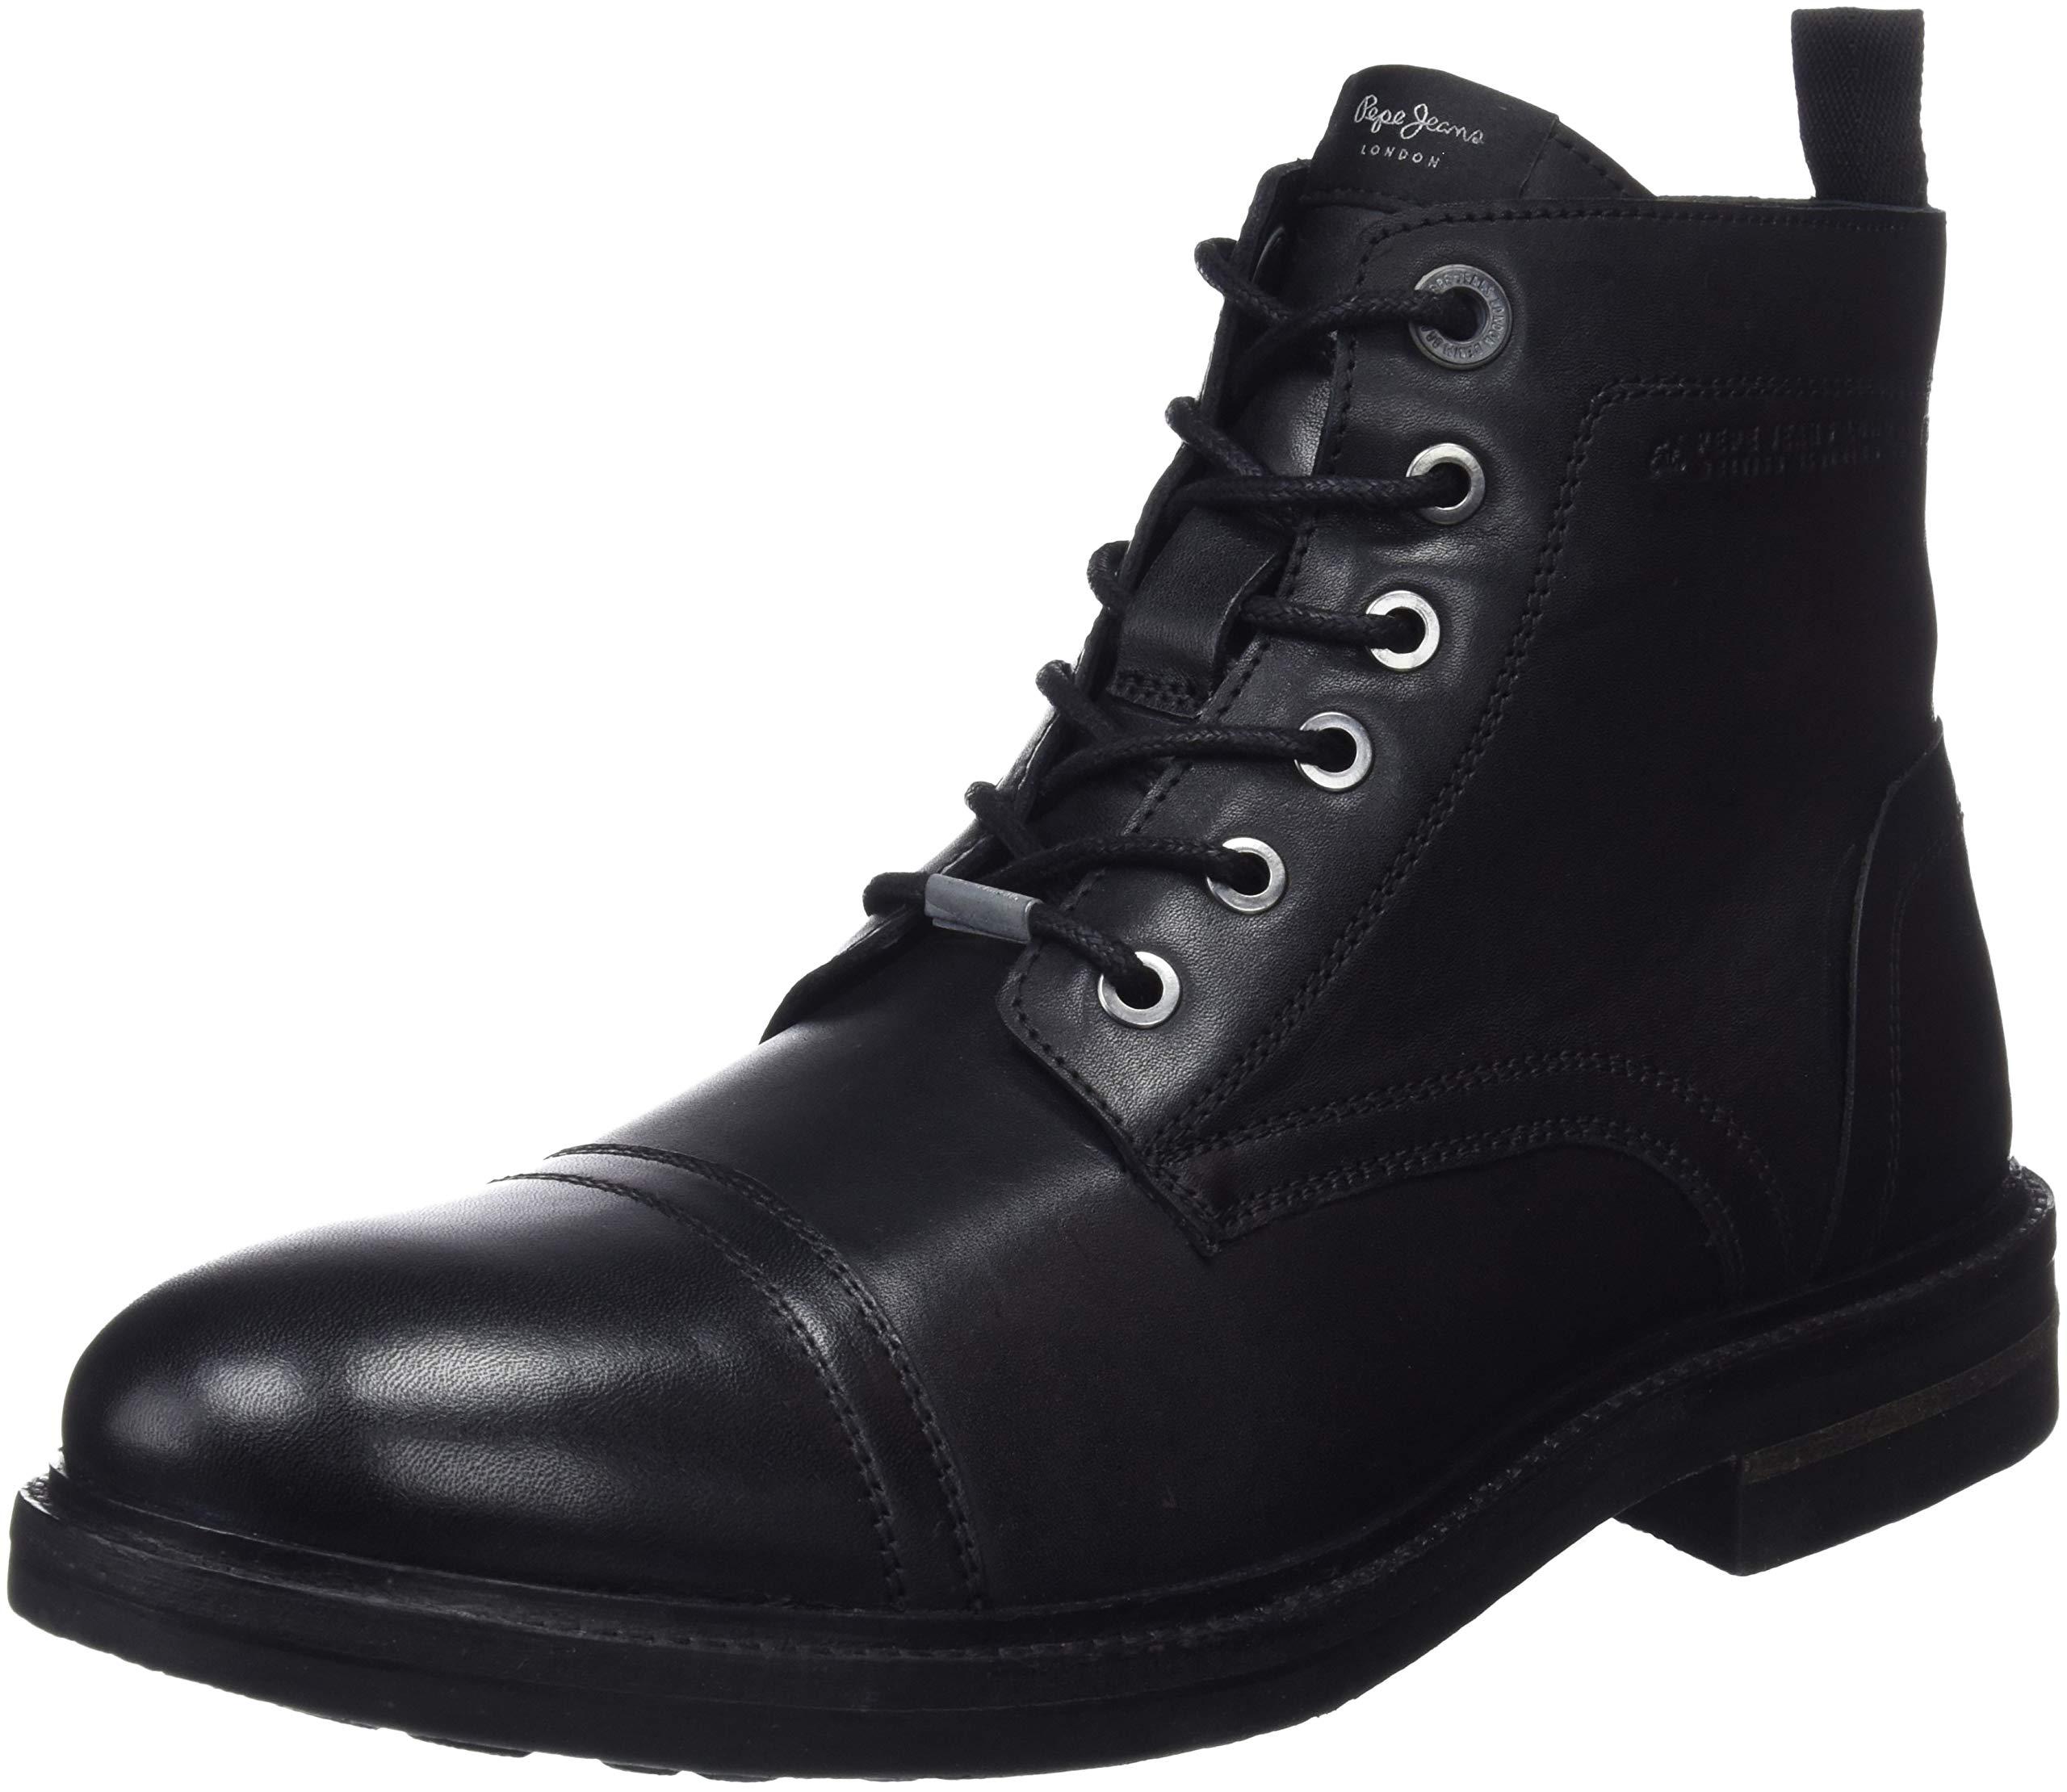 99946 Eu Jeans Pepe London Hubert Bottines Classiques BootBottesamp; HommeNoirblack R4j5AL